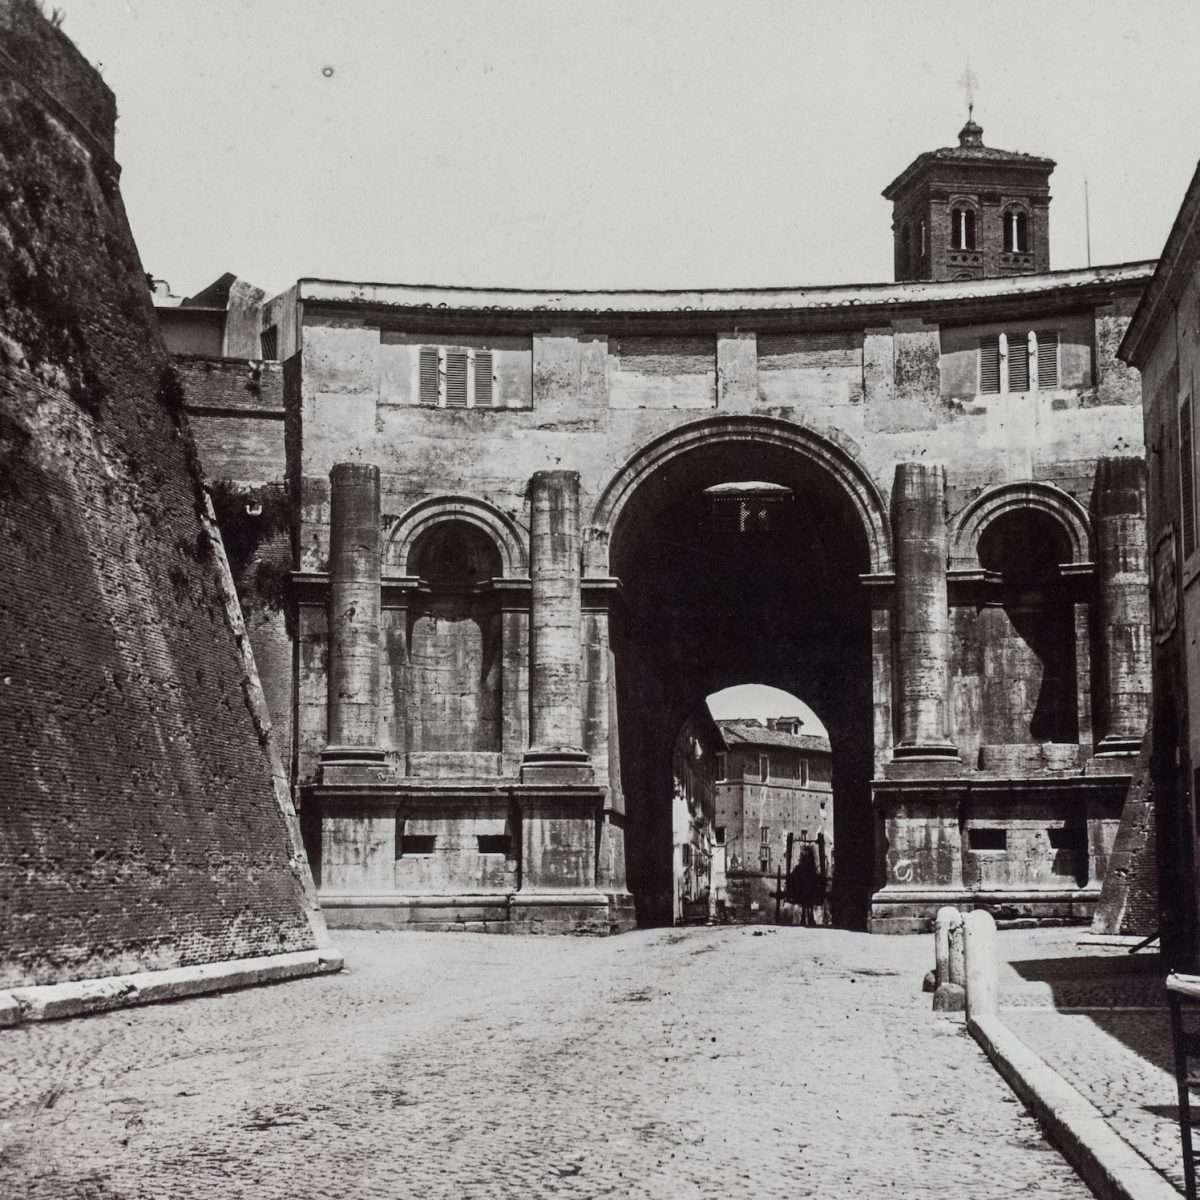 L-1090212 - Porta Santo Spirito